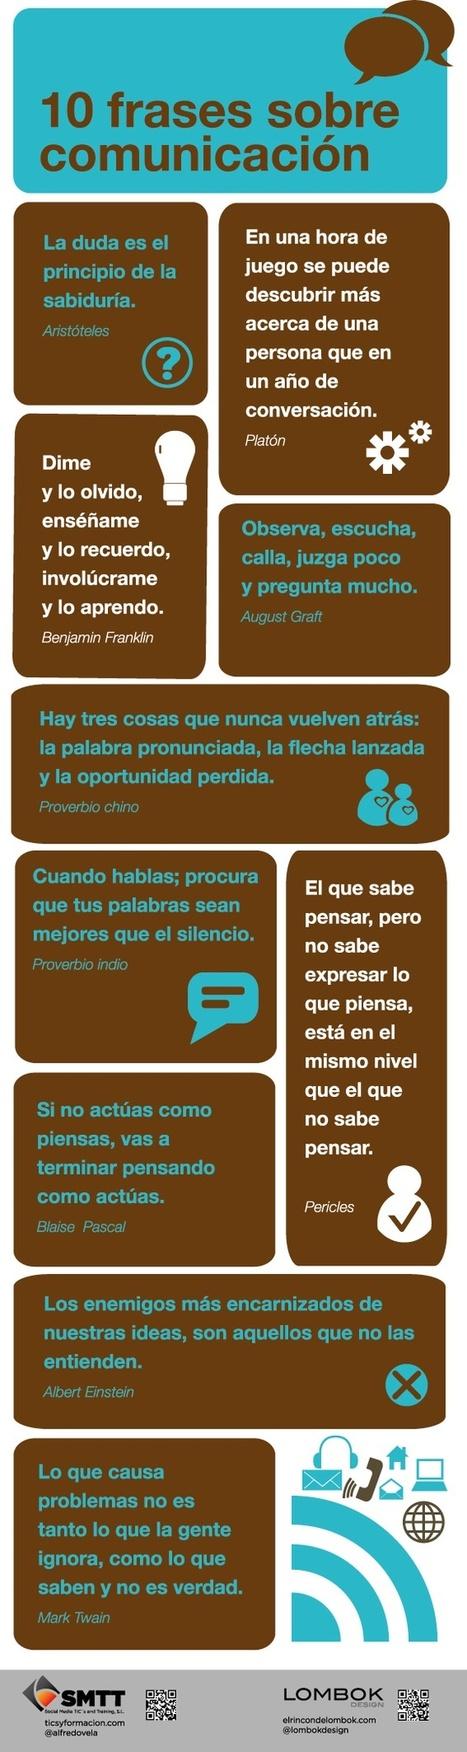 Infografiando: 10 frases sobre comunicación | Periodismo ciudadano | Scoop.it